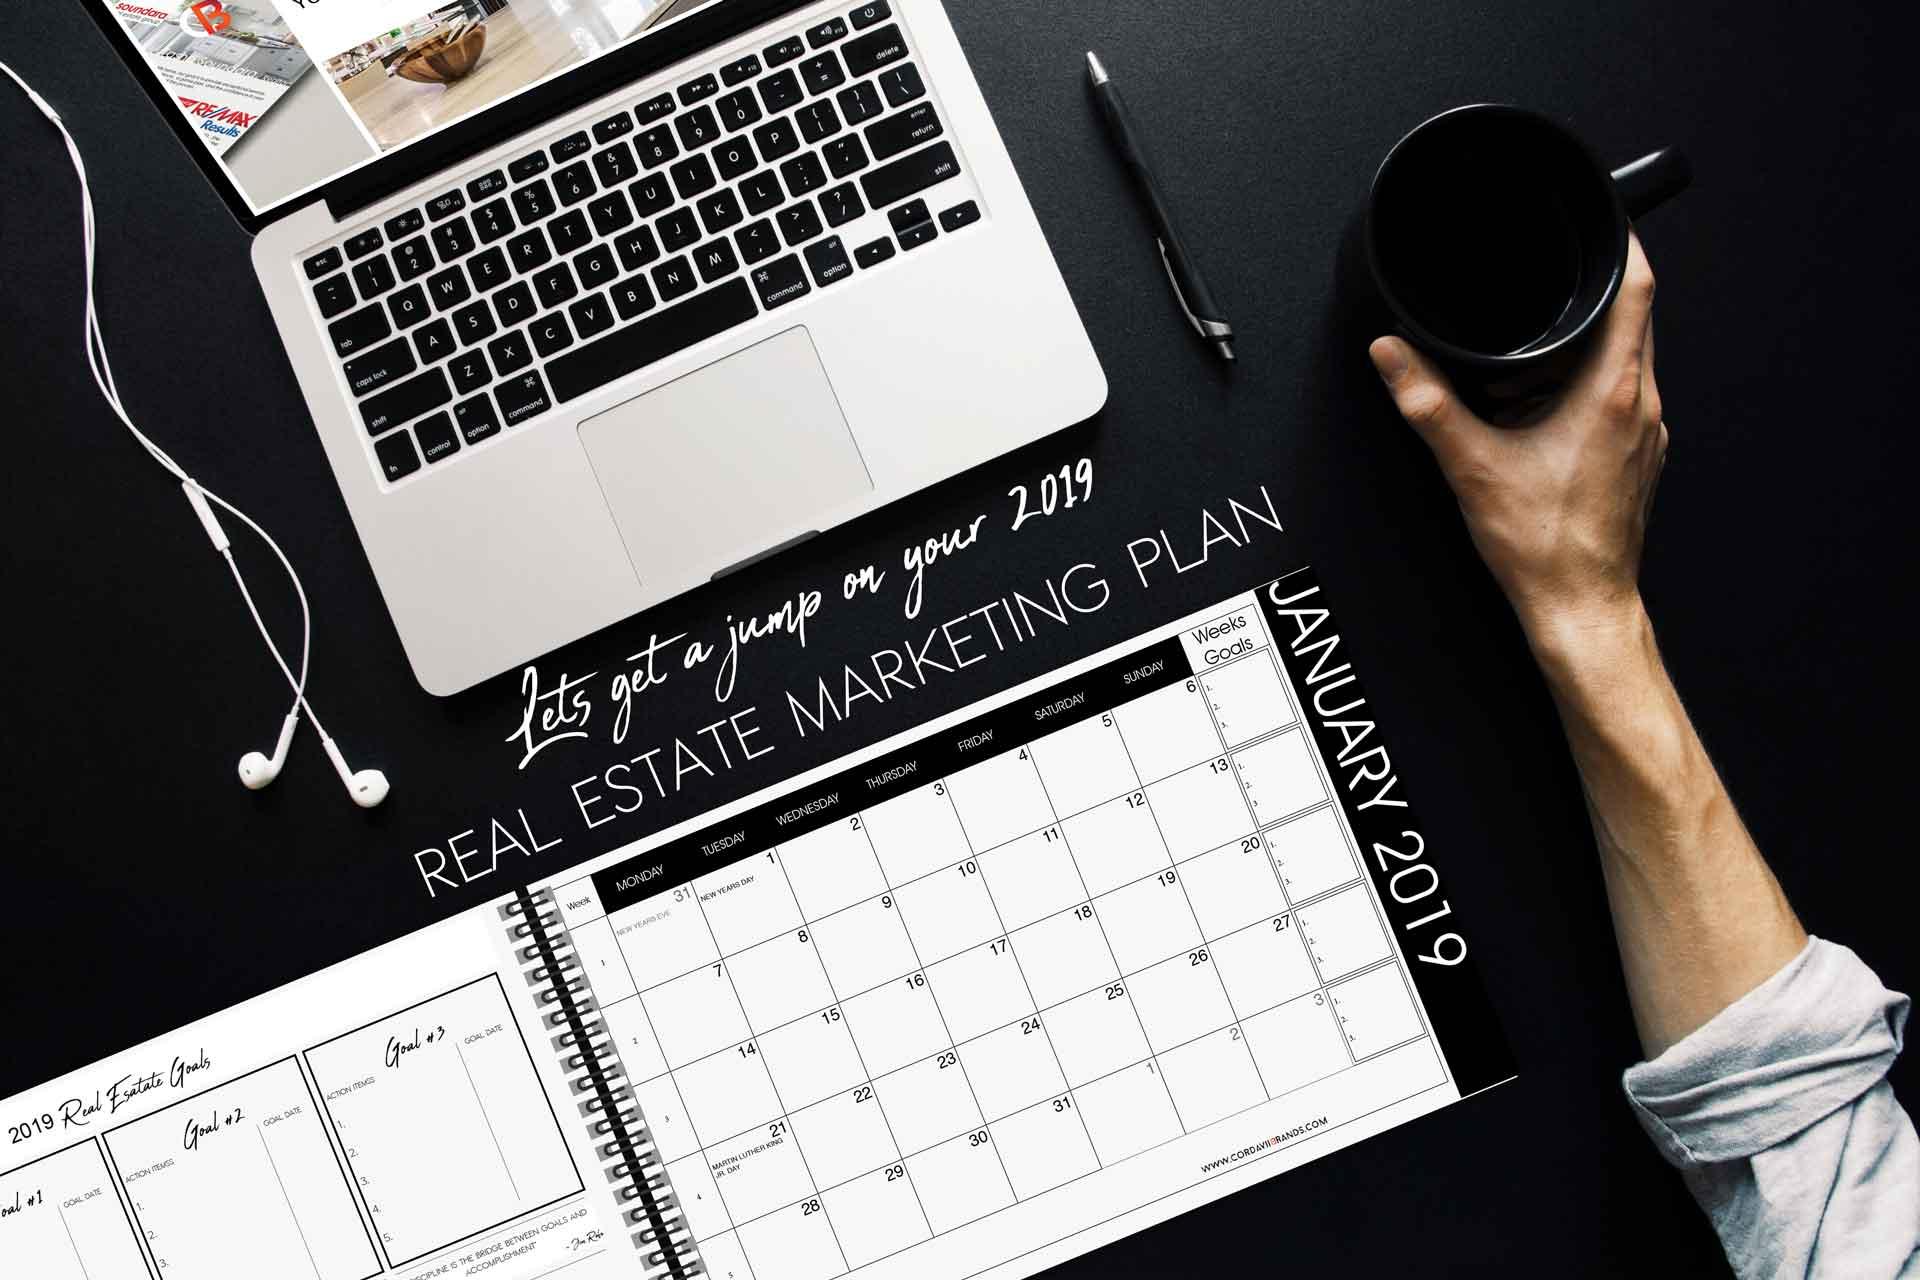 Cordavii Brand Consulting Real Estate Marketing Calendar - Lets get a jump on you 2019 real estate marketing plan.